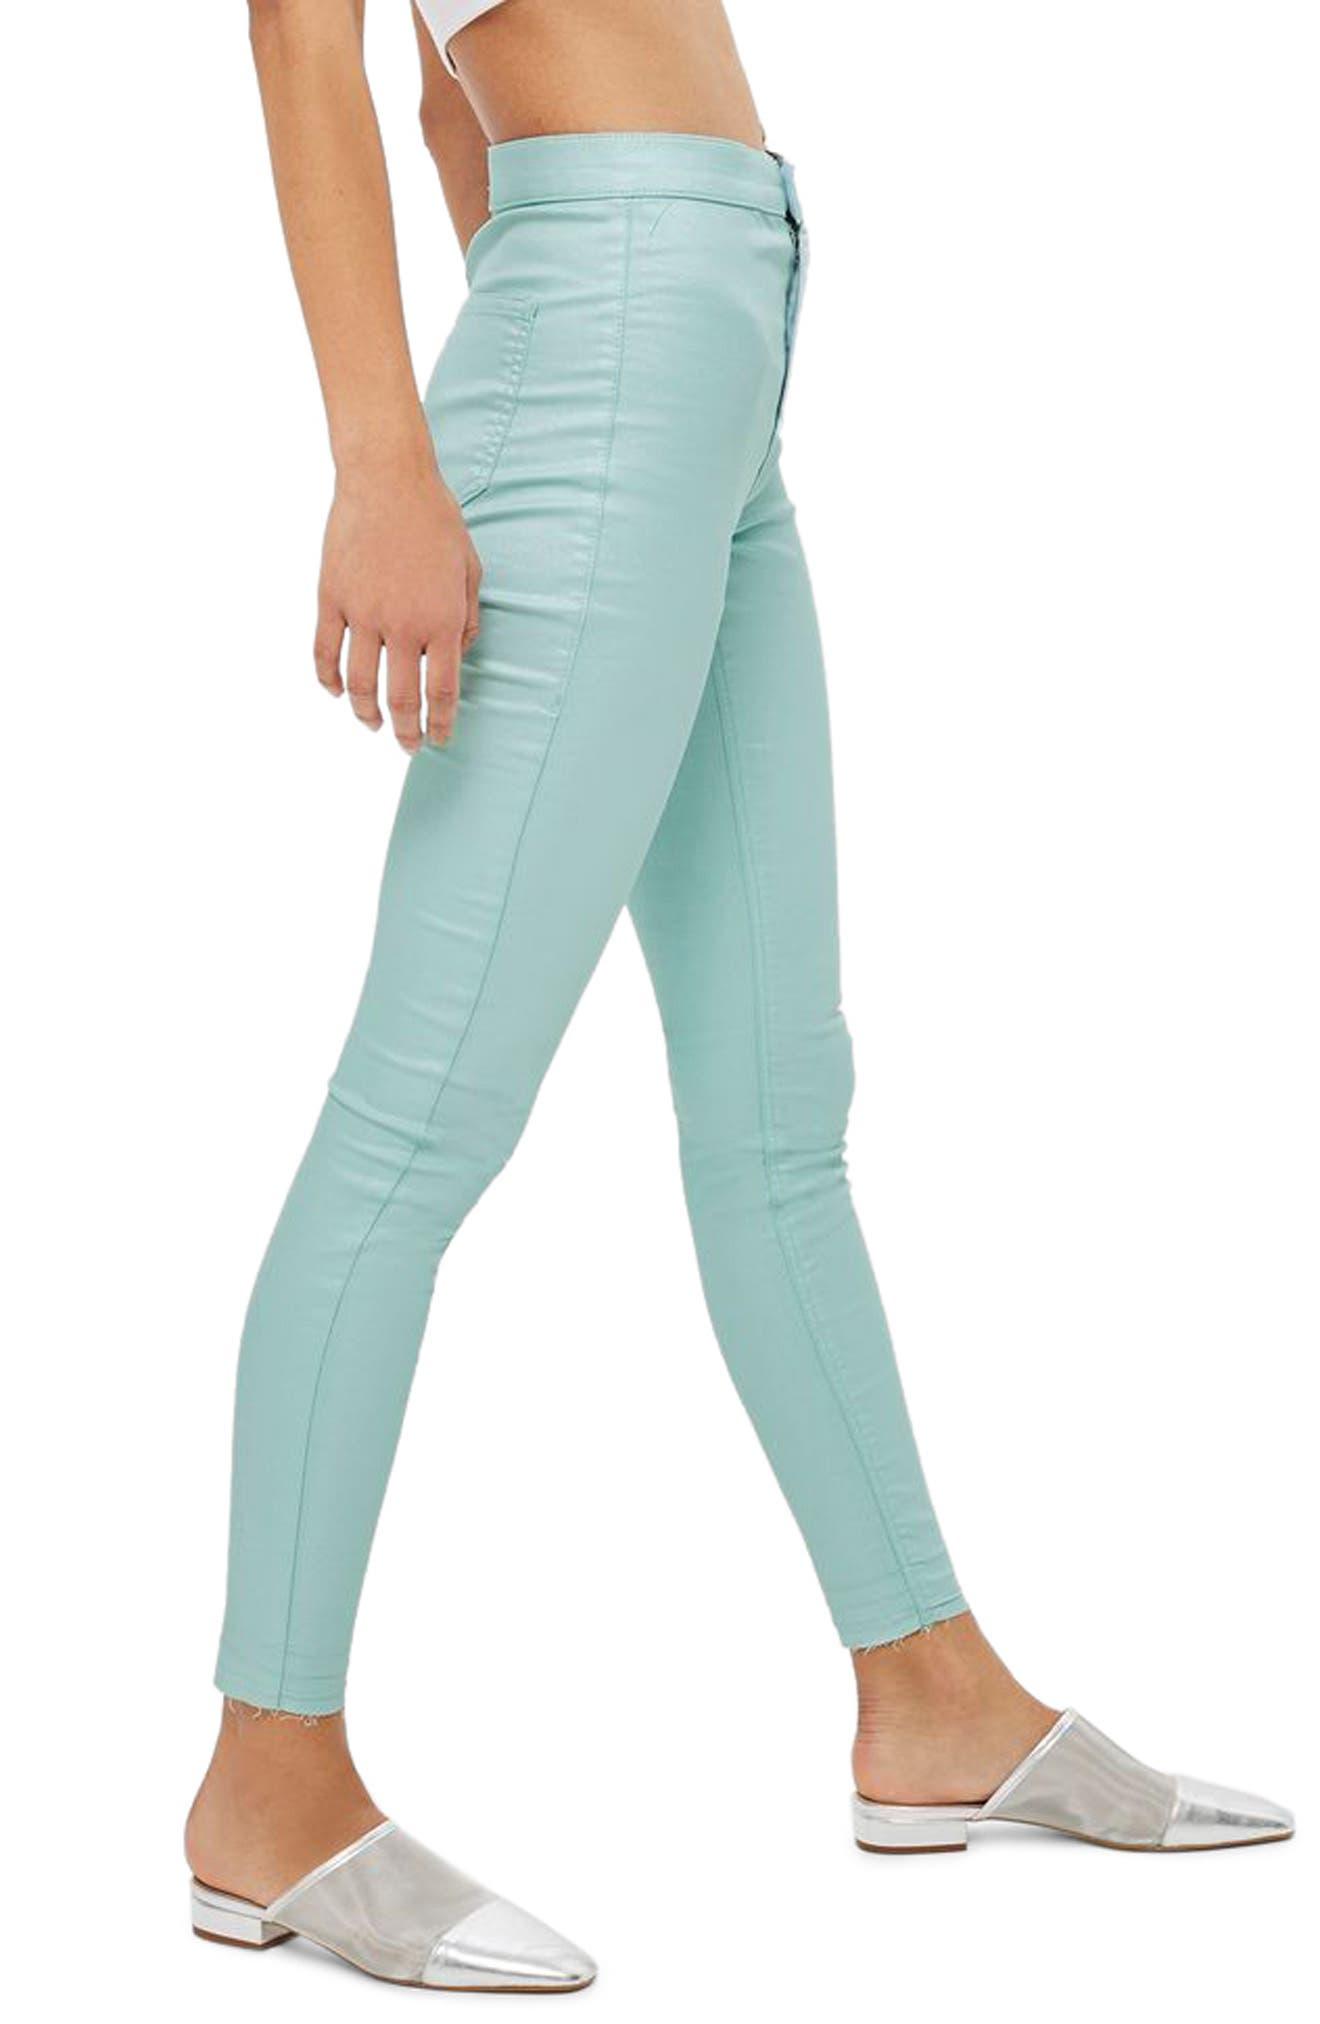 Joni Shimmer Skinny Jeans,                         Main,                         color,